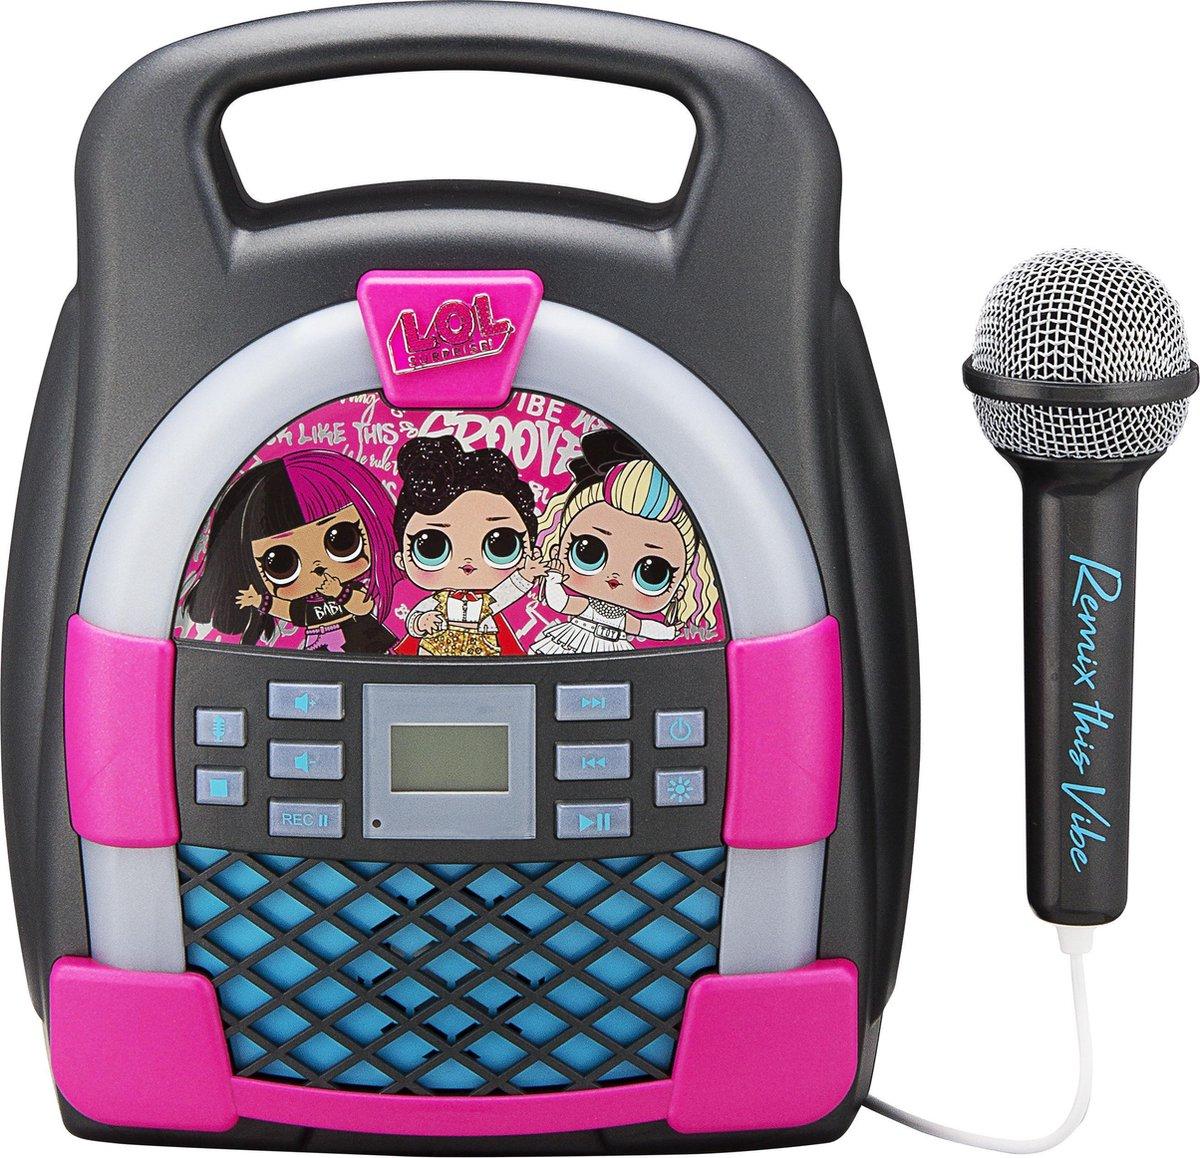 L.O.L. Suprise MP3 Karaokeset met licht show en bluetooth  LL-553